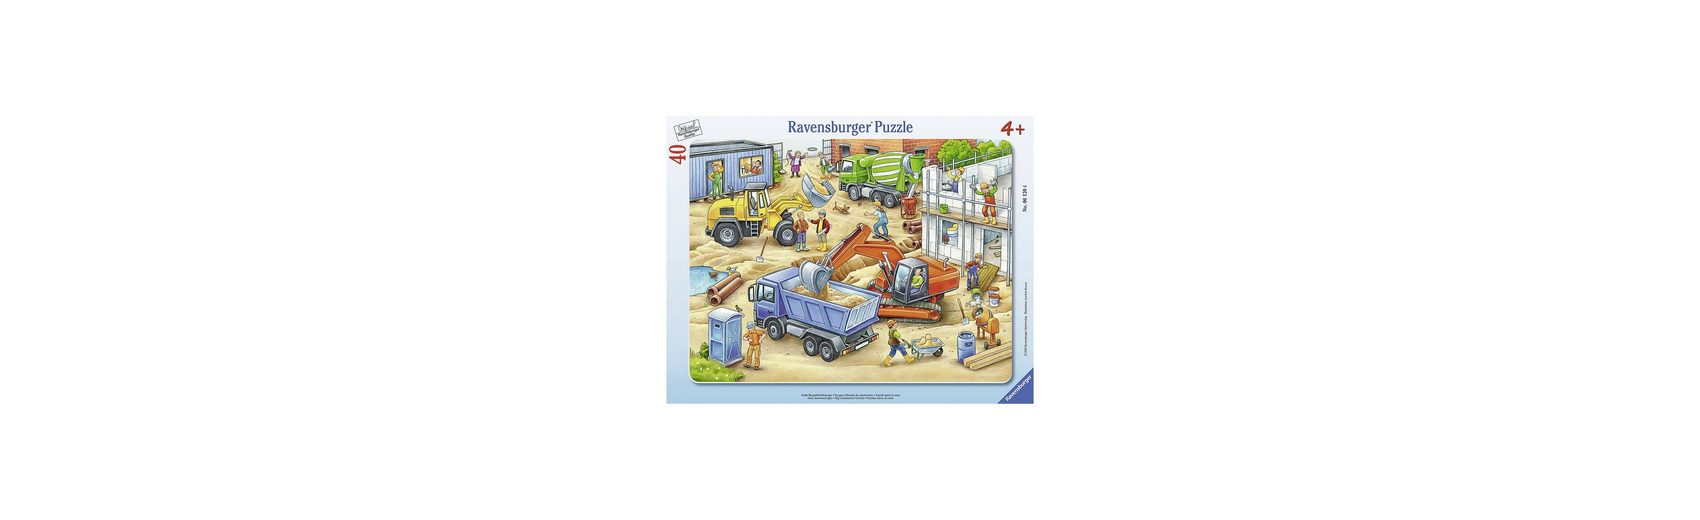 Ravensburger Rahmenpuzzle Große Baustellenfahrzeuge 40 Teile